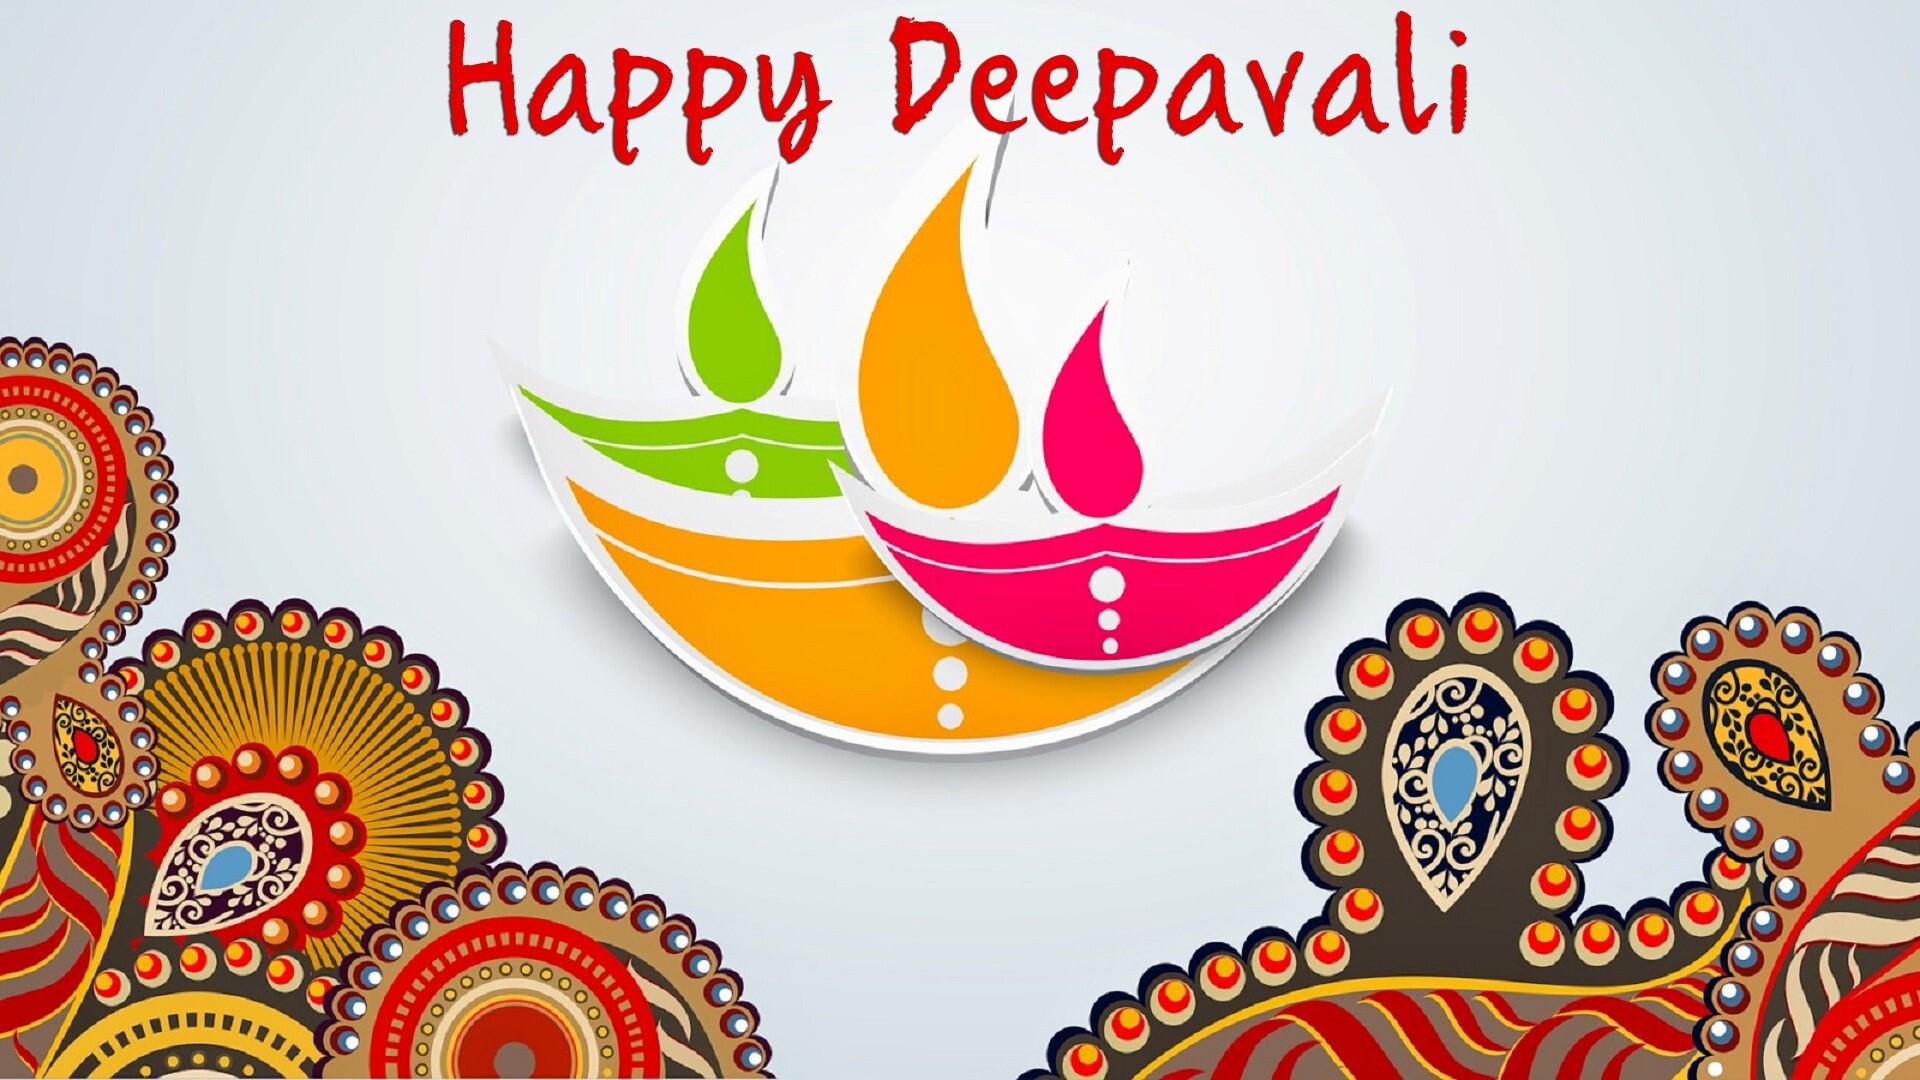 Popular Wallpaper High Quality Diwali - Happy_Deepavali_Indian_Festival_HD_Wallpapers  2018_16398.jpg